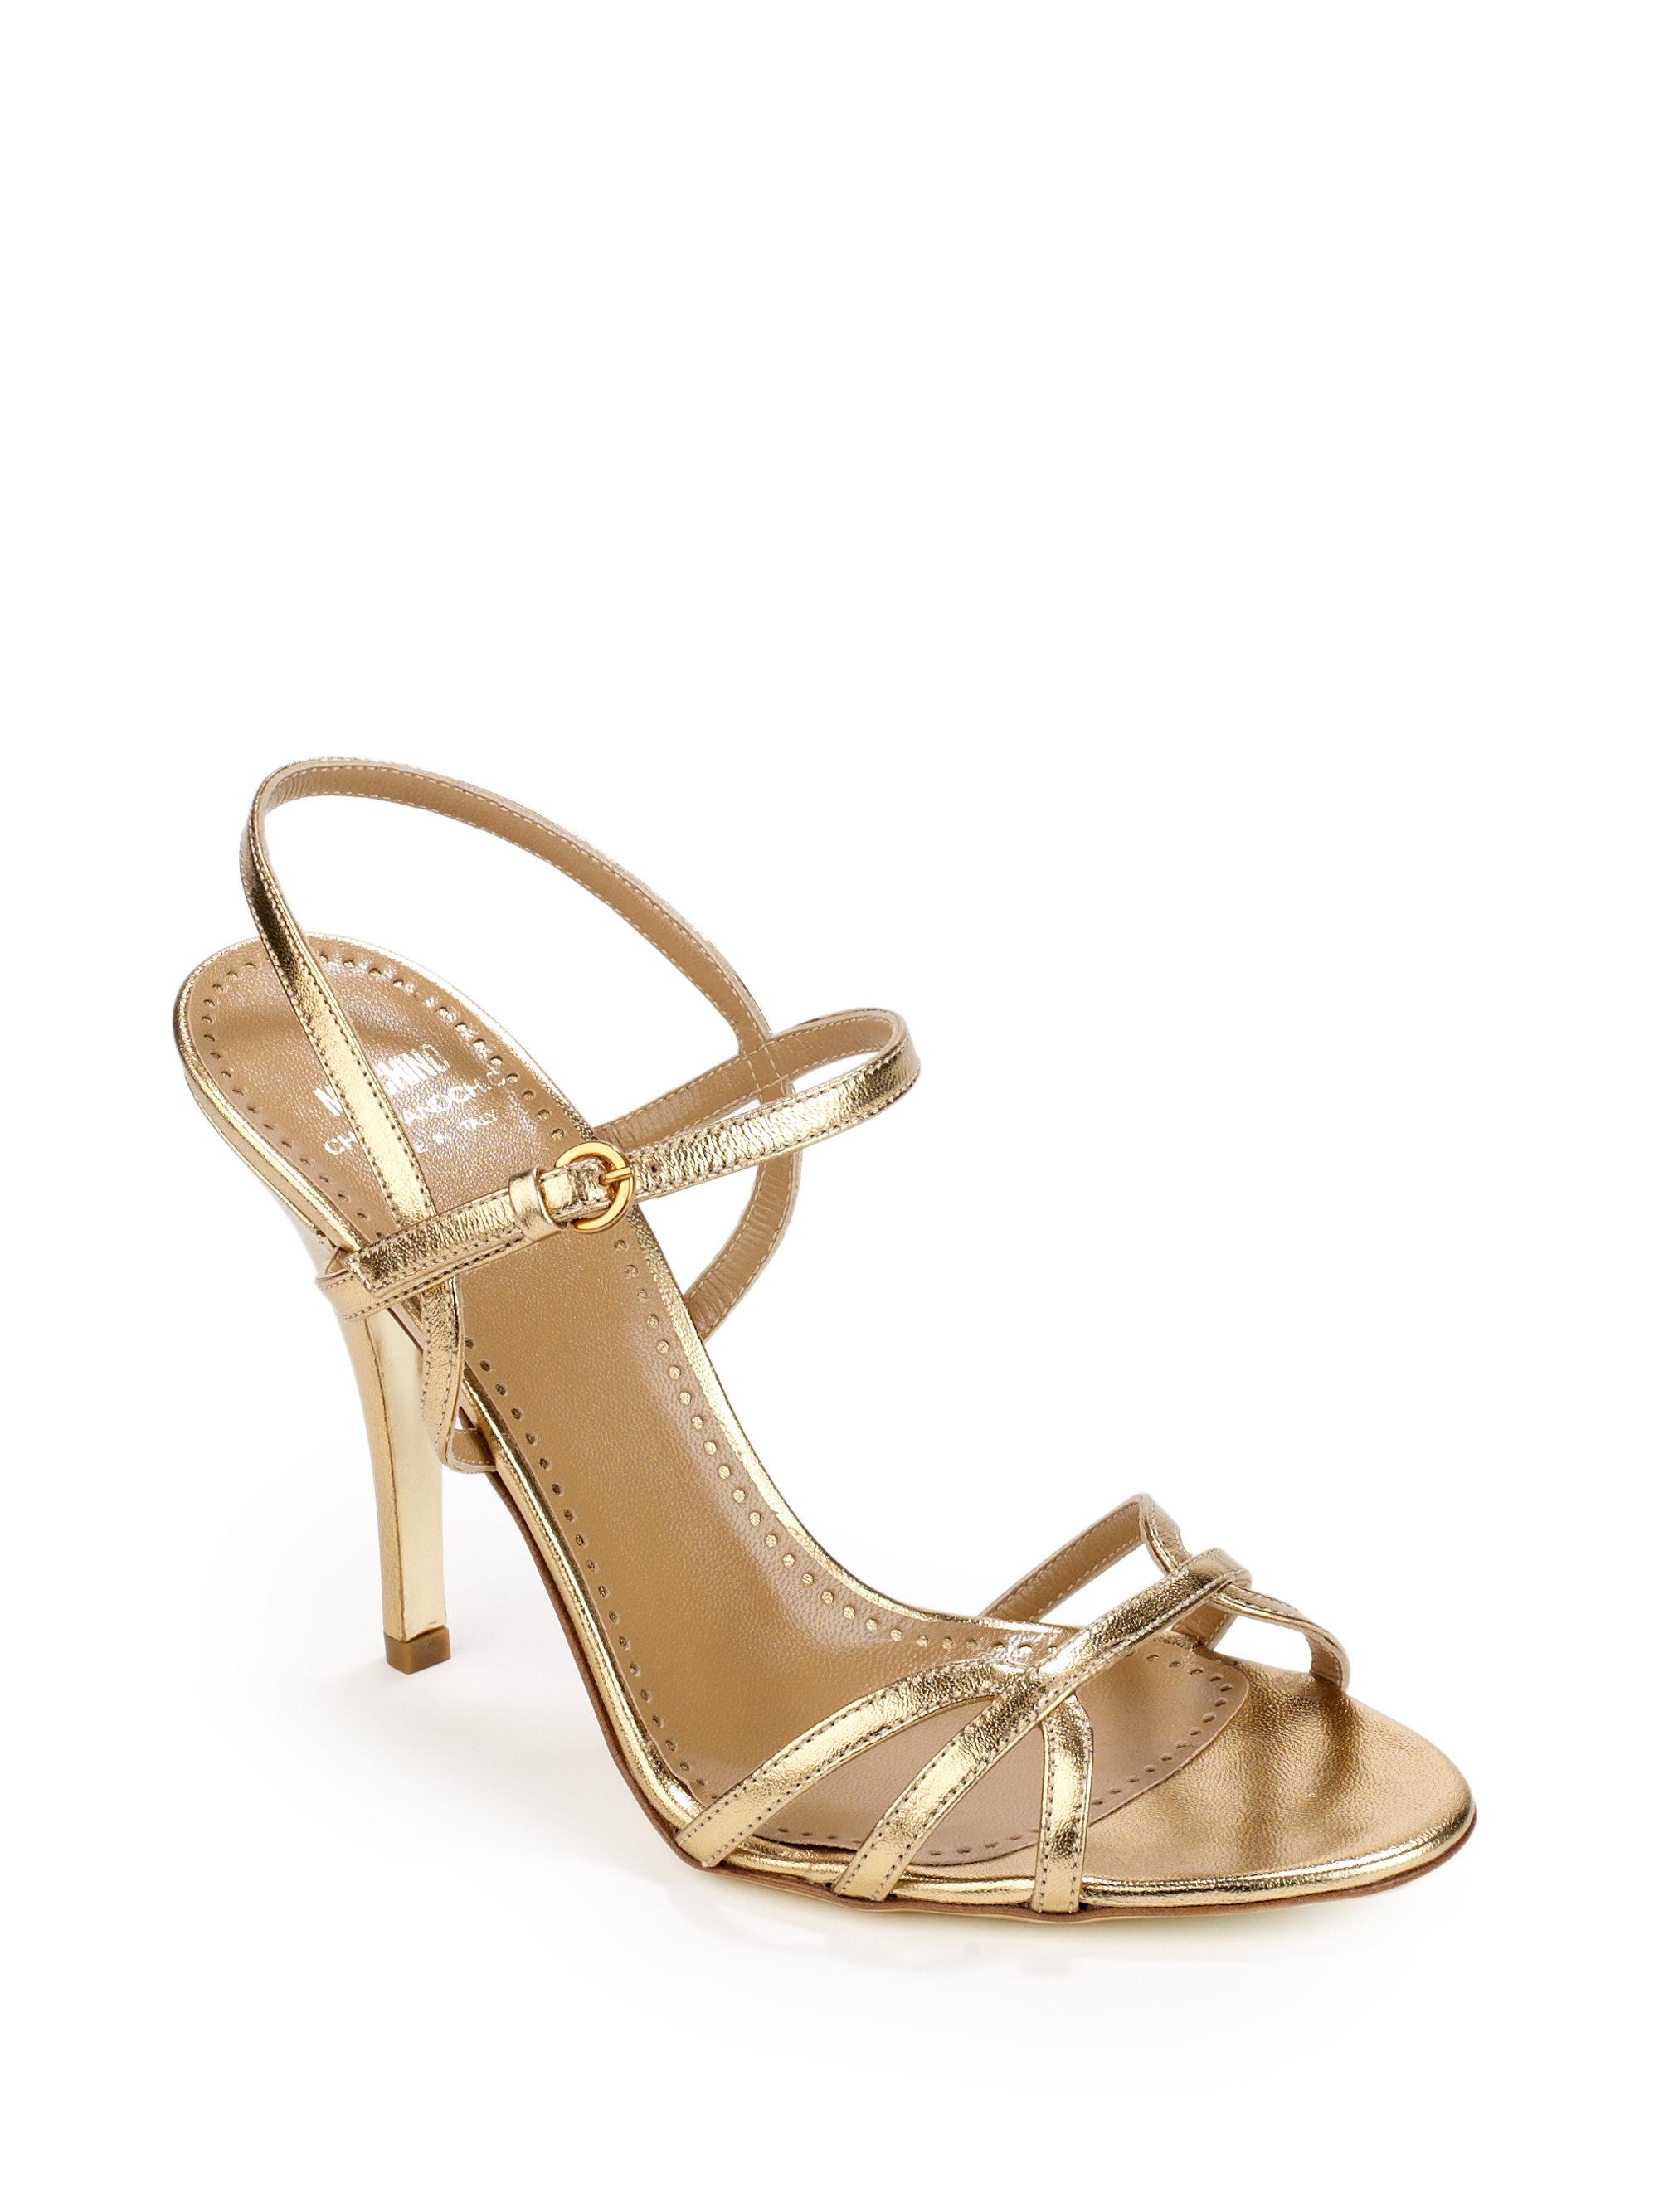 Moschino Metallic Leather High Heel Sandals in Metallic | Lyst